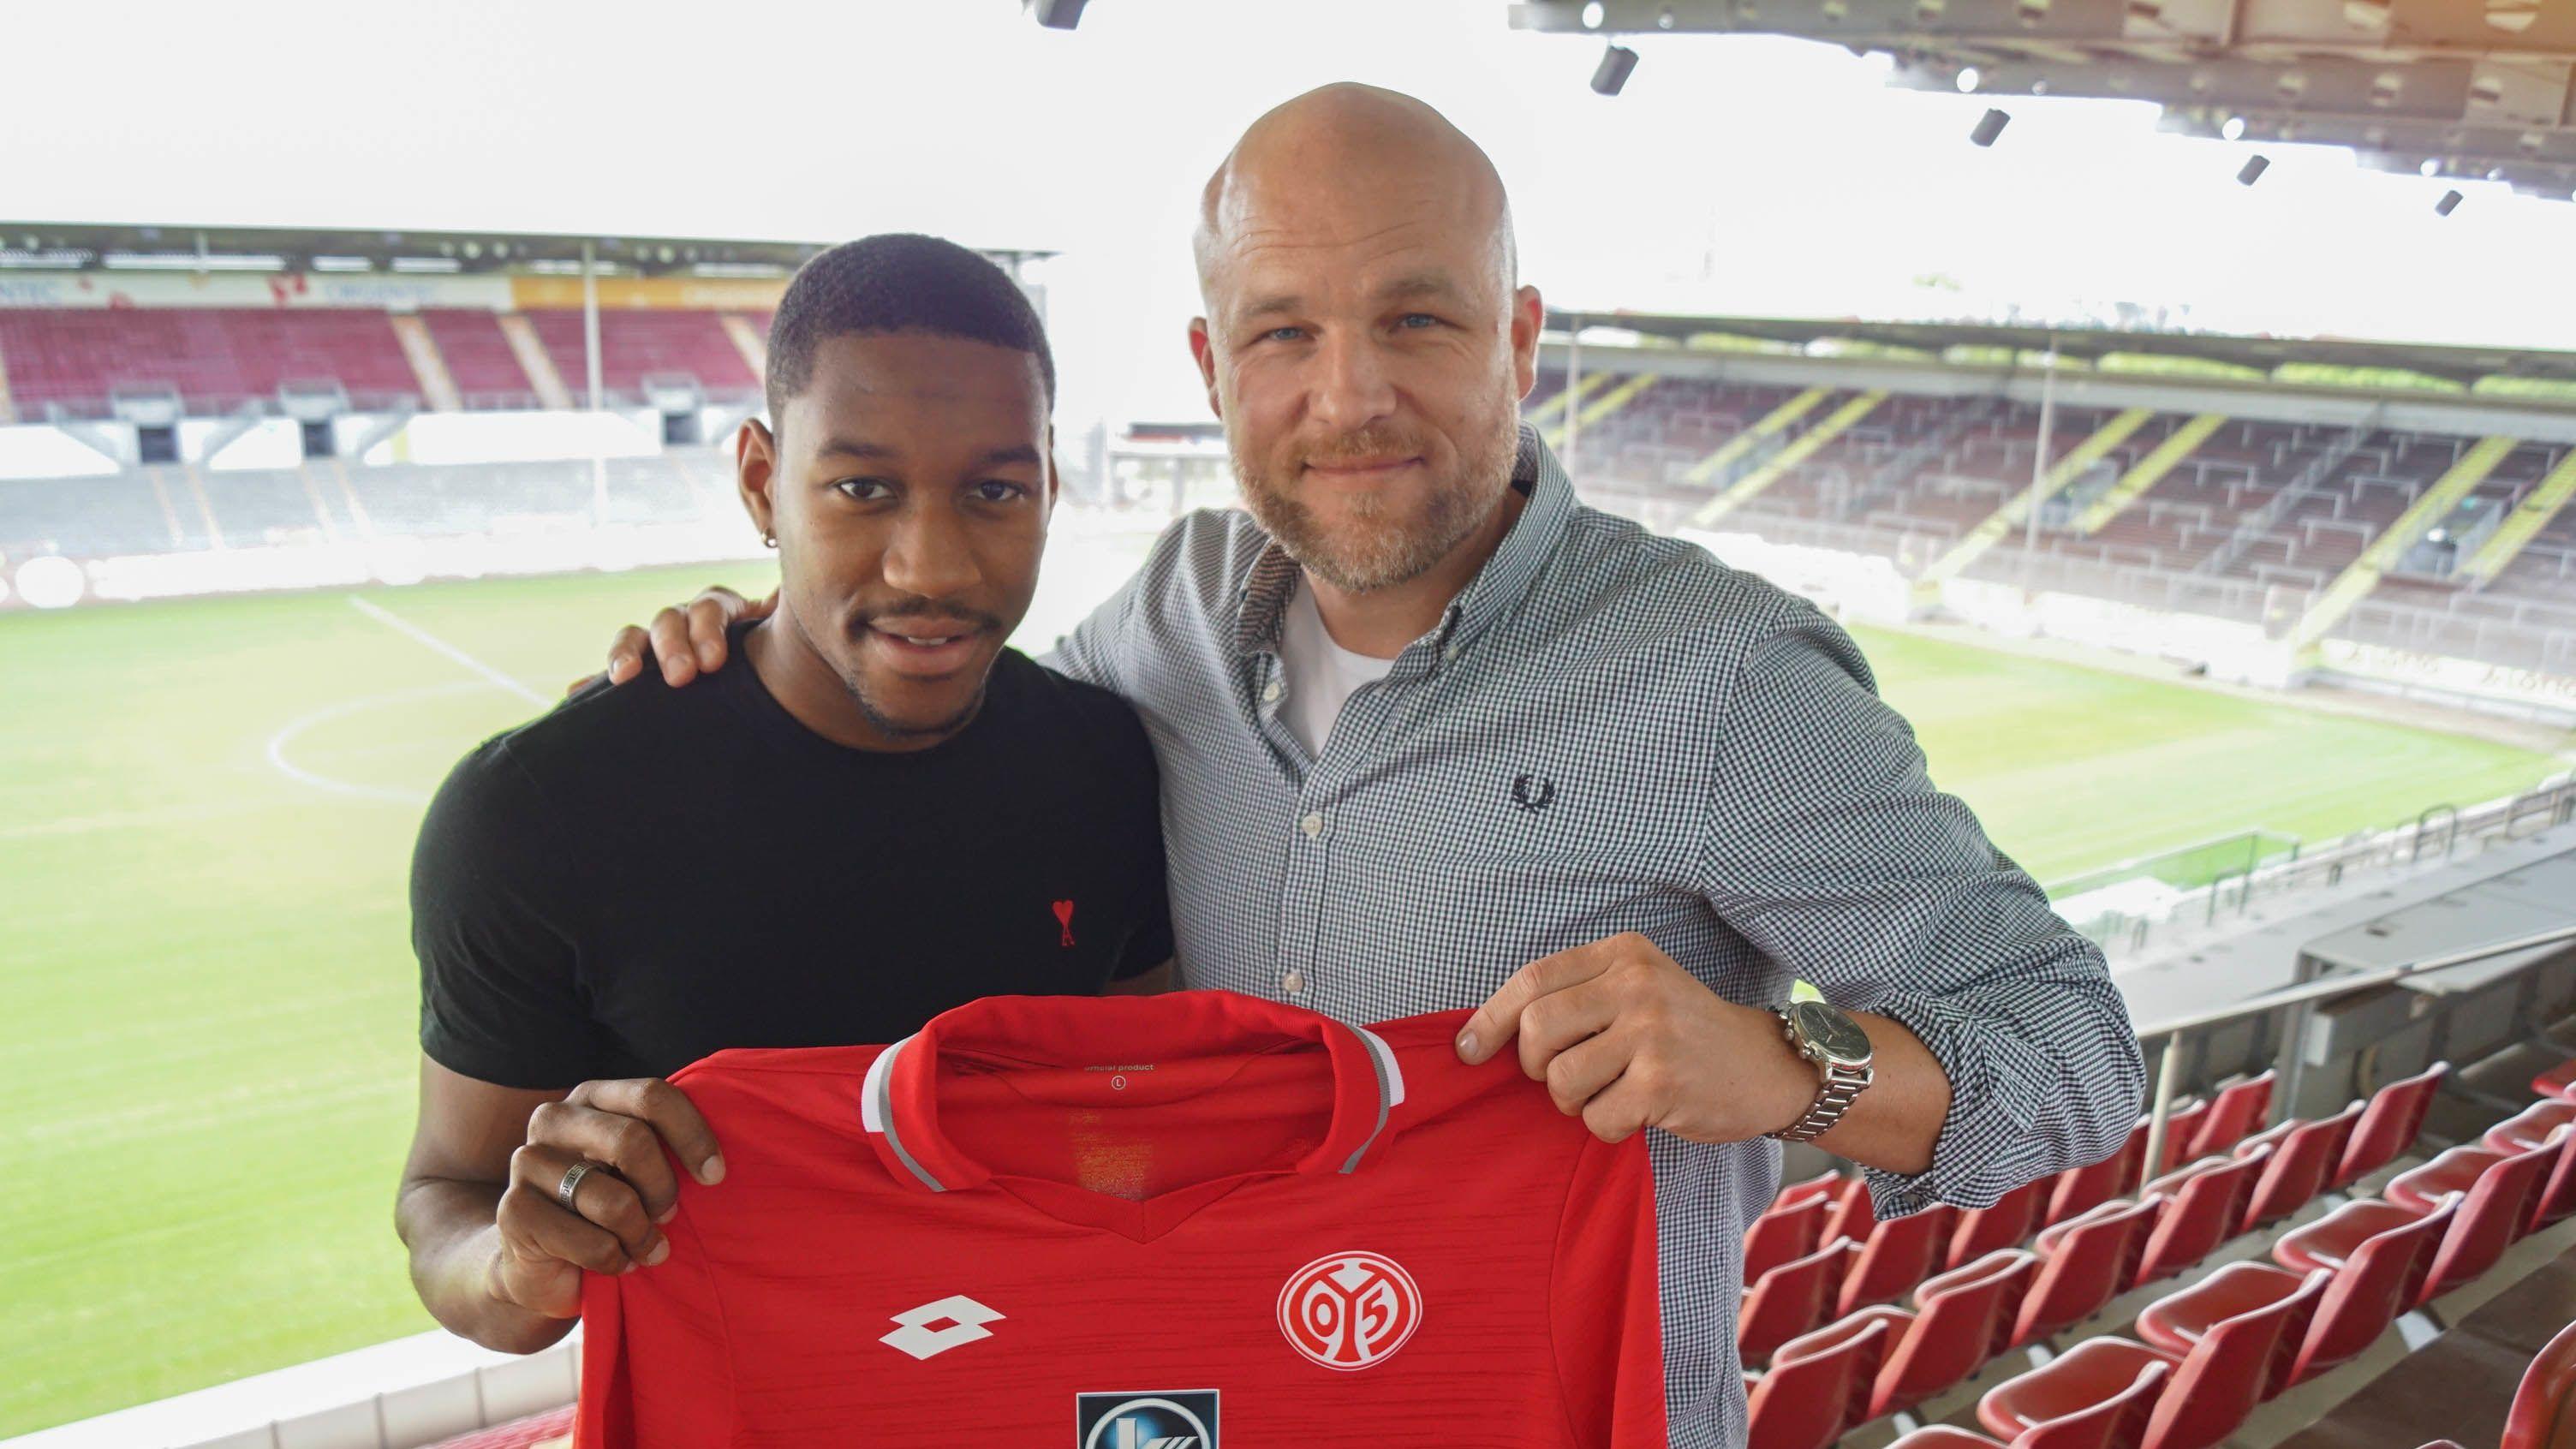 """Klasse Charakter"": Mainz holt Pierre-Gabriel | Bundesliga - kicker"